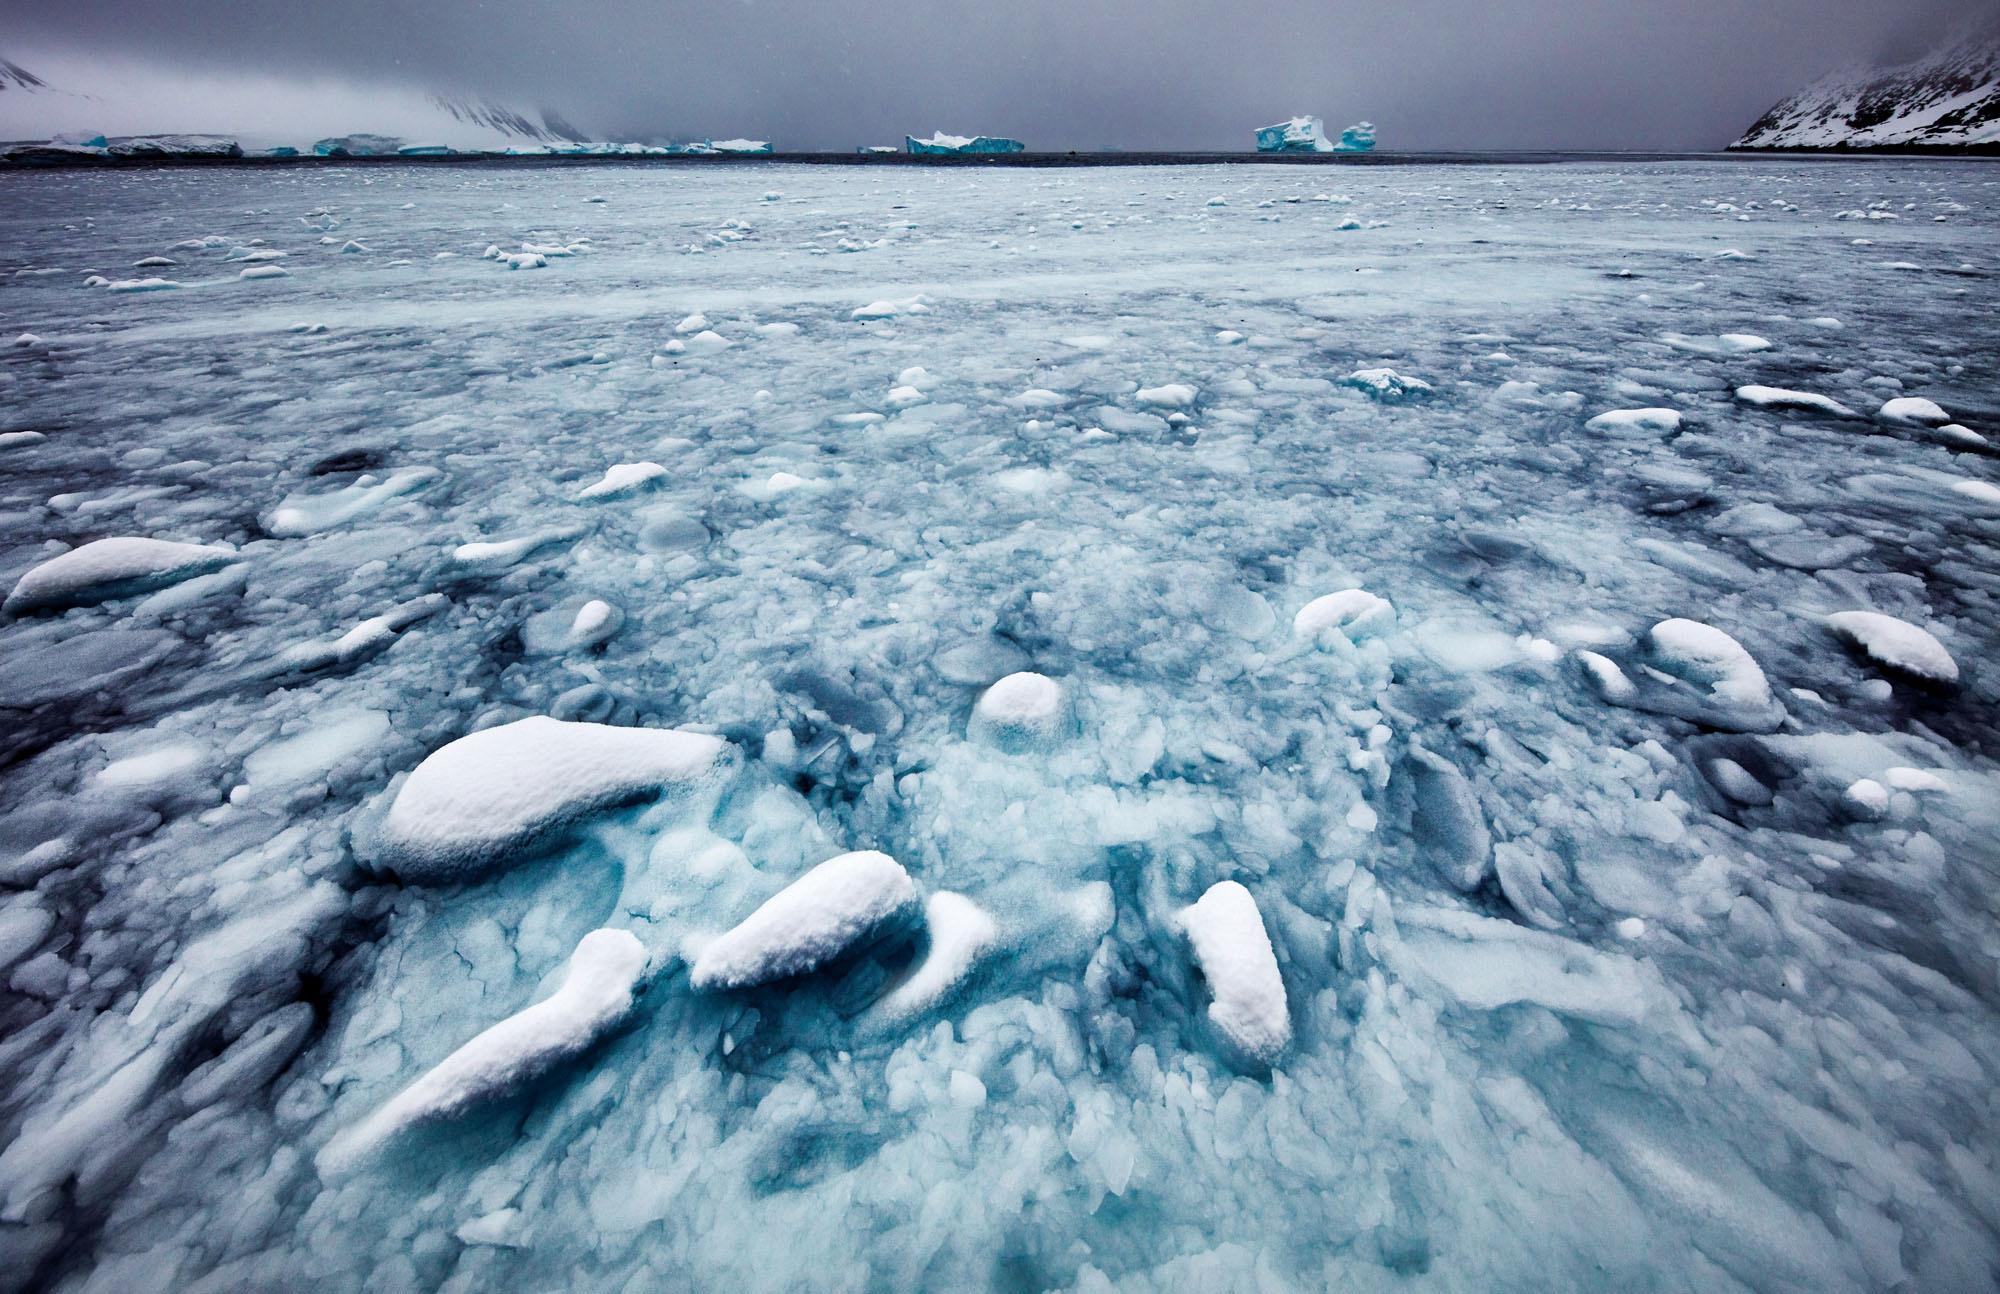 Astrolabe Island, Antarctica. Canon EOS 1DX, Canon 11-14mm, f10 @ 1/320 second, ISO 100